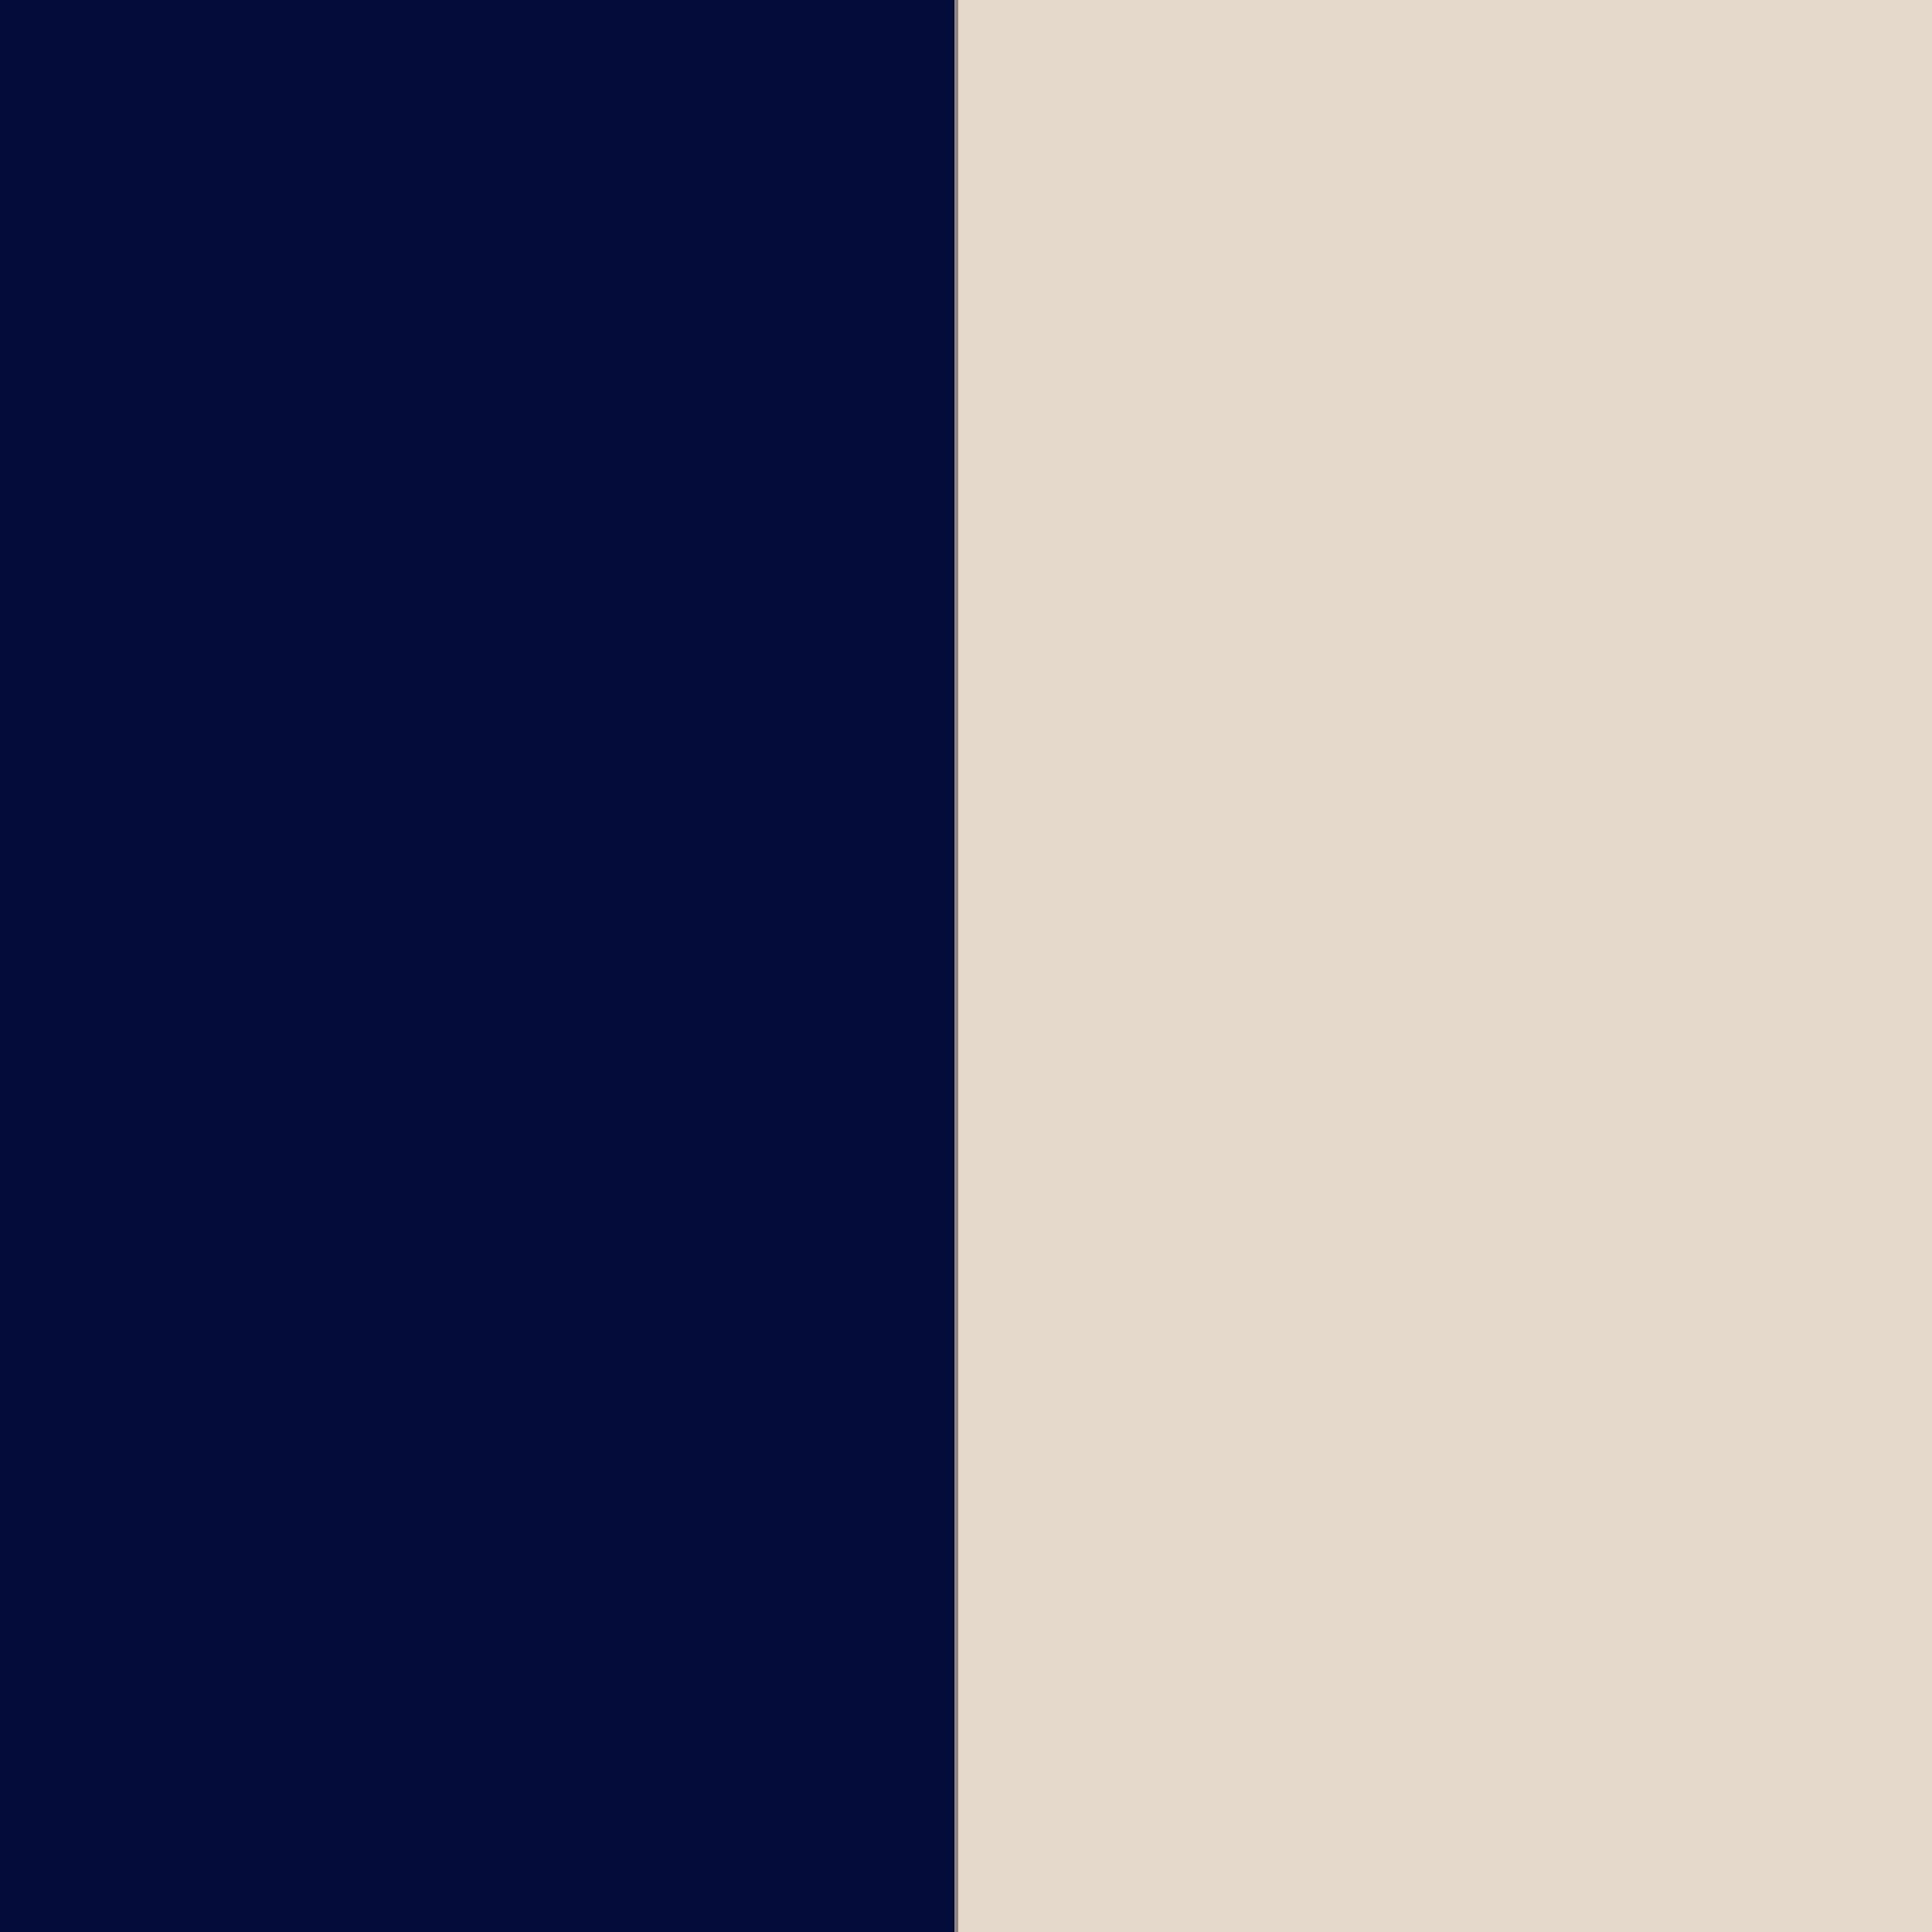 bleumarine + bej 2